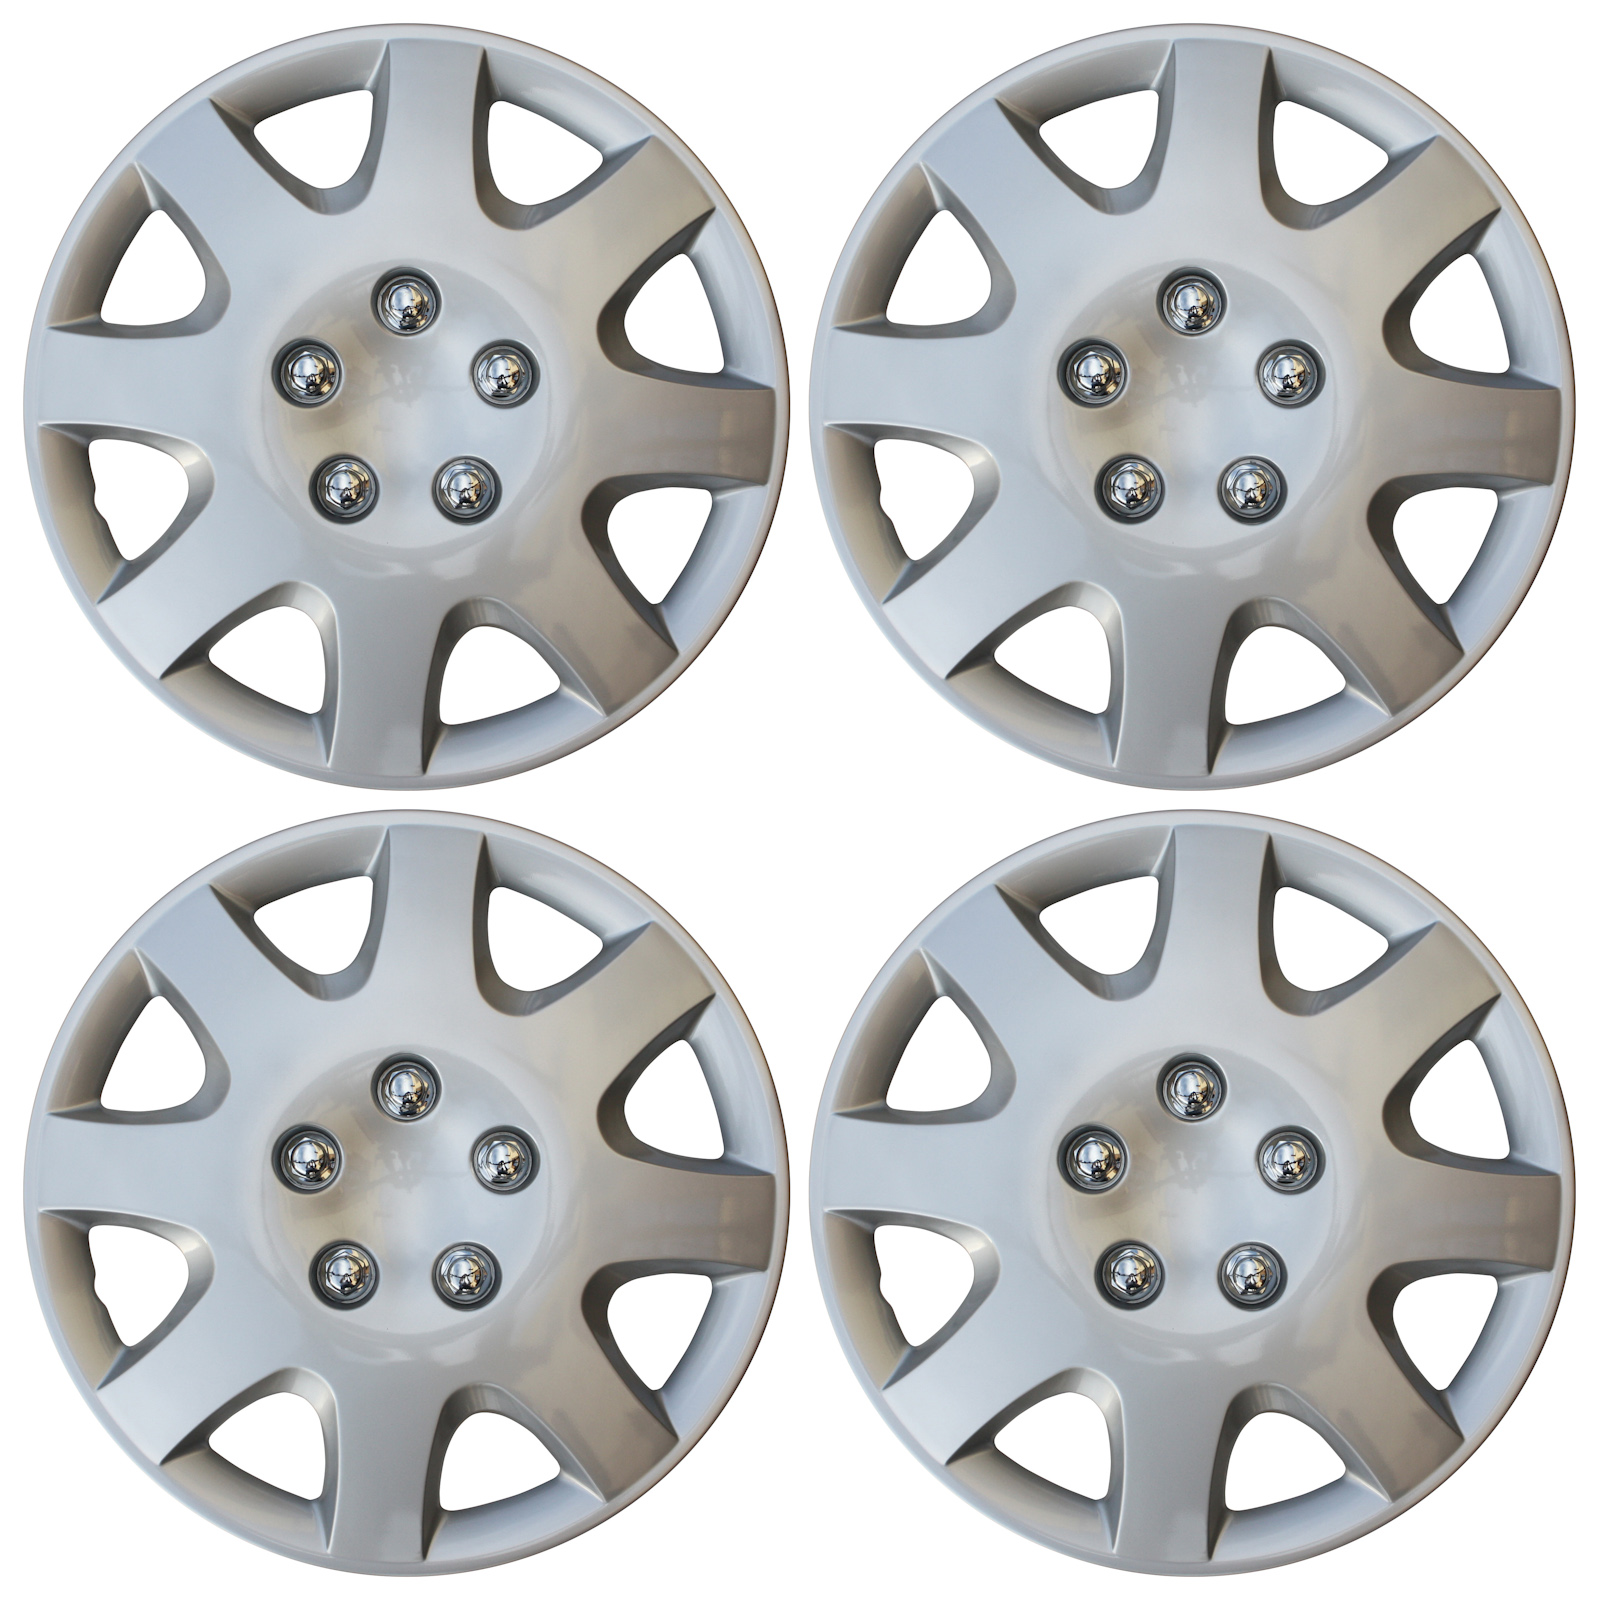 "Hub Cap ABS Silver 15"" Inch Rim Wheel Skin Cover Center 4 pc Set Caps Covers"